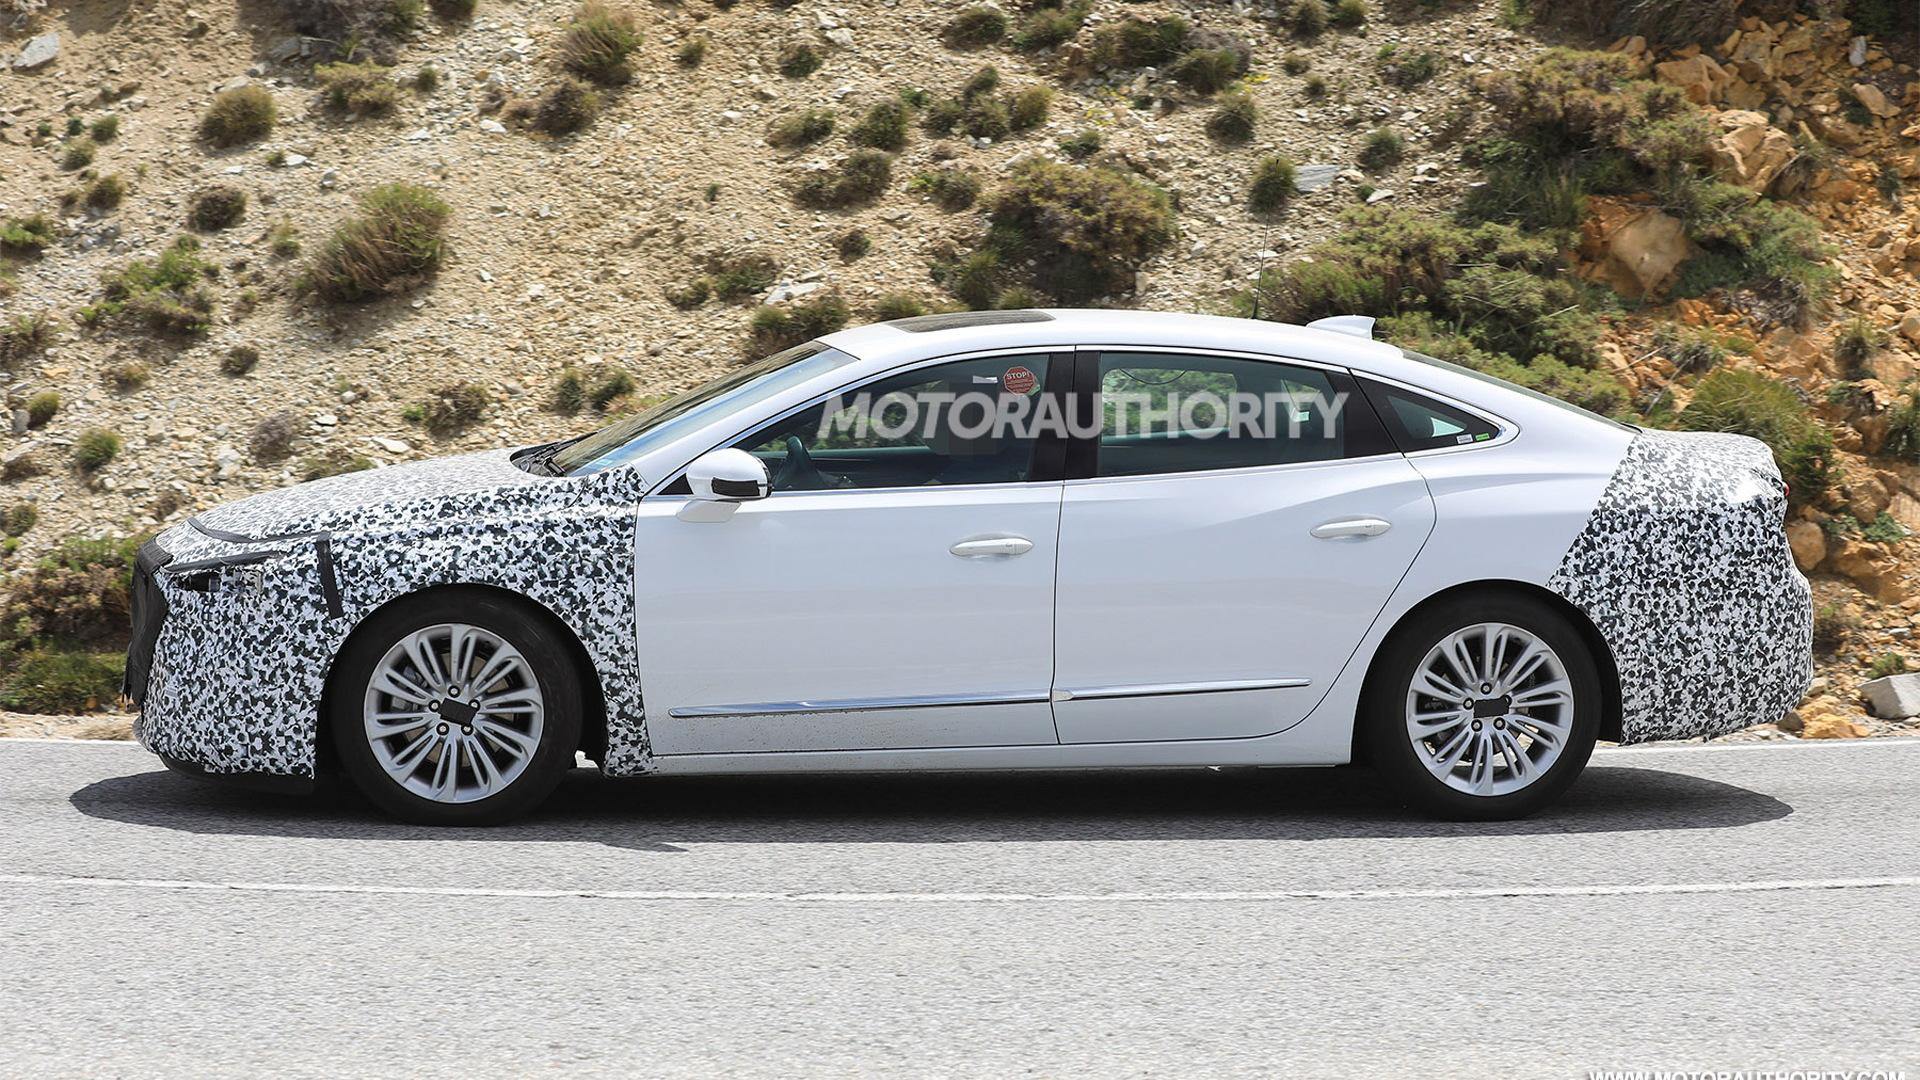 2020 Buick LaCrosse facelift spy shots - Image via S. Baldauf/SB-Medien